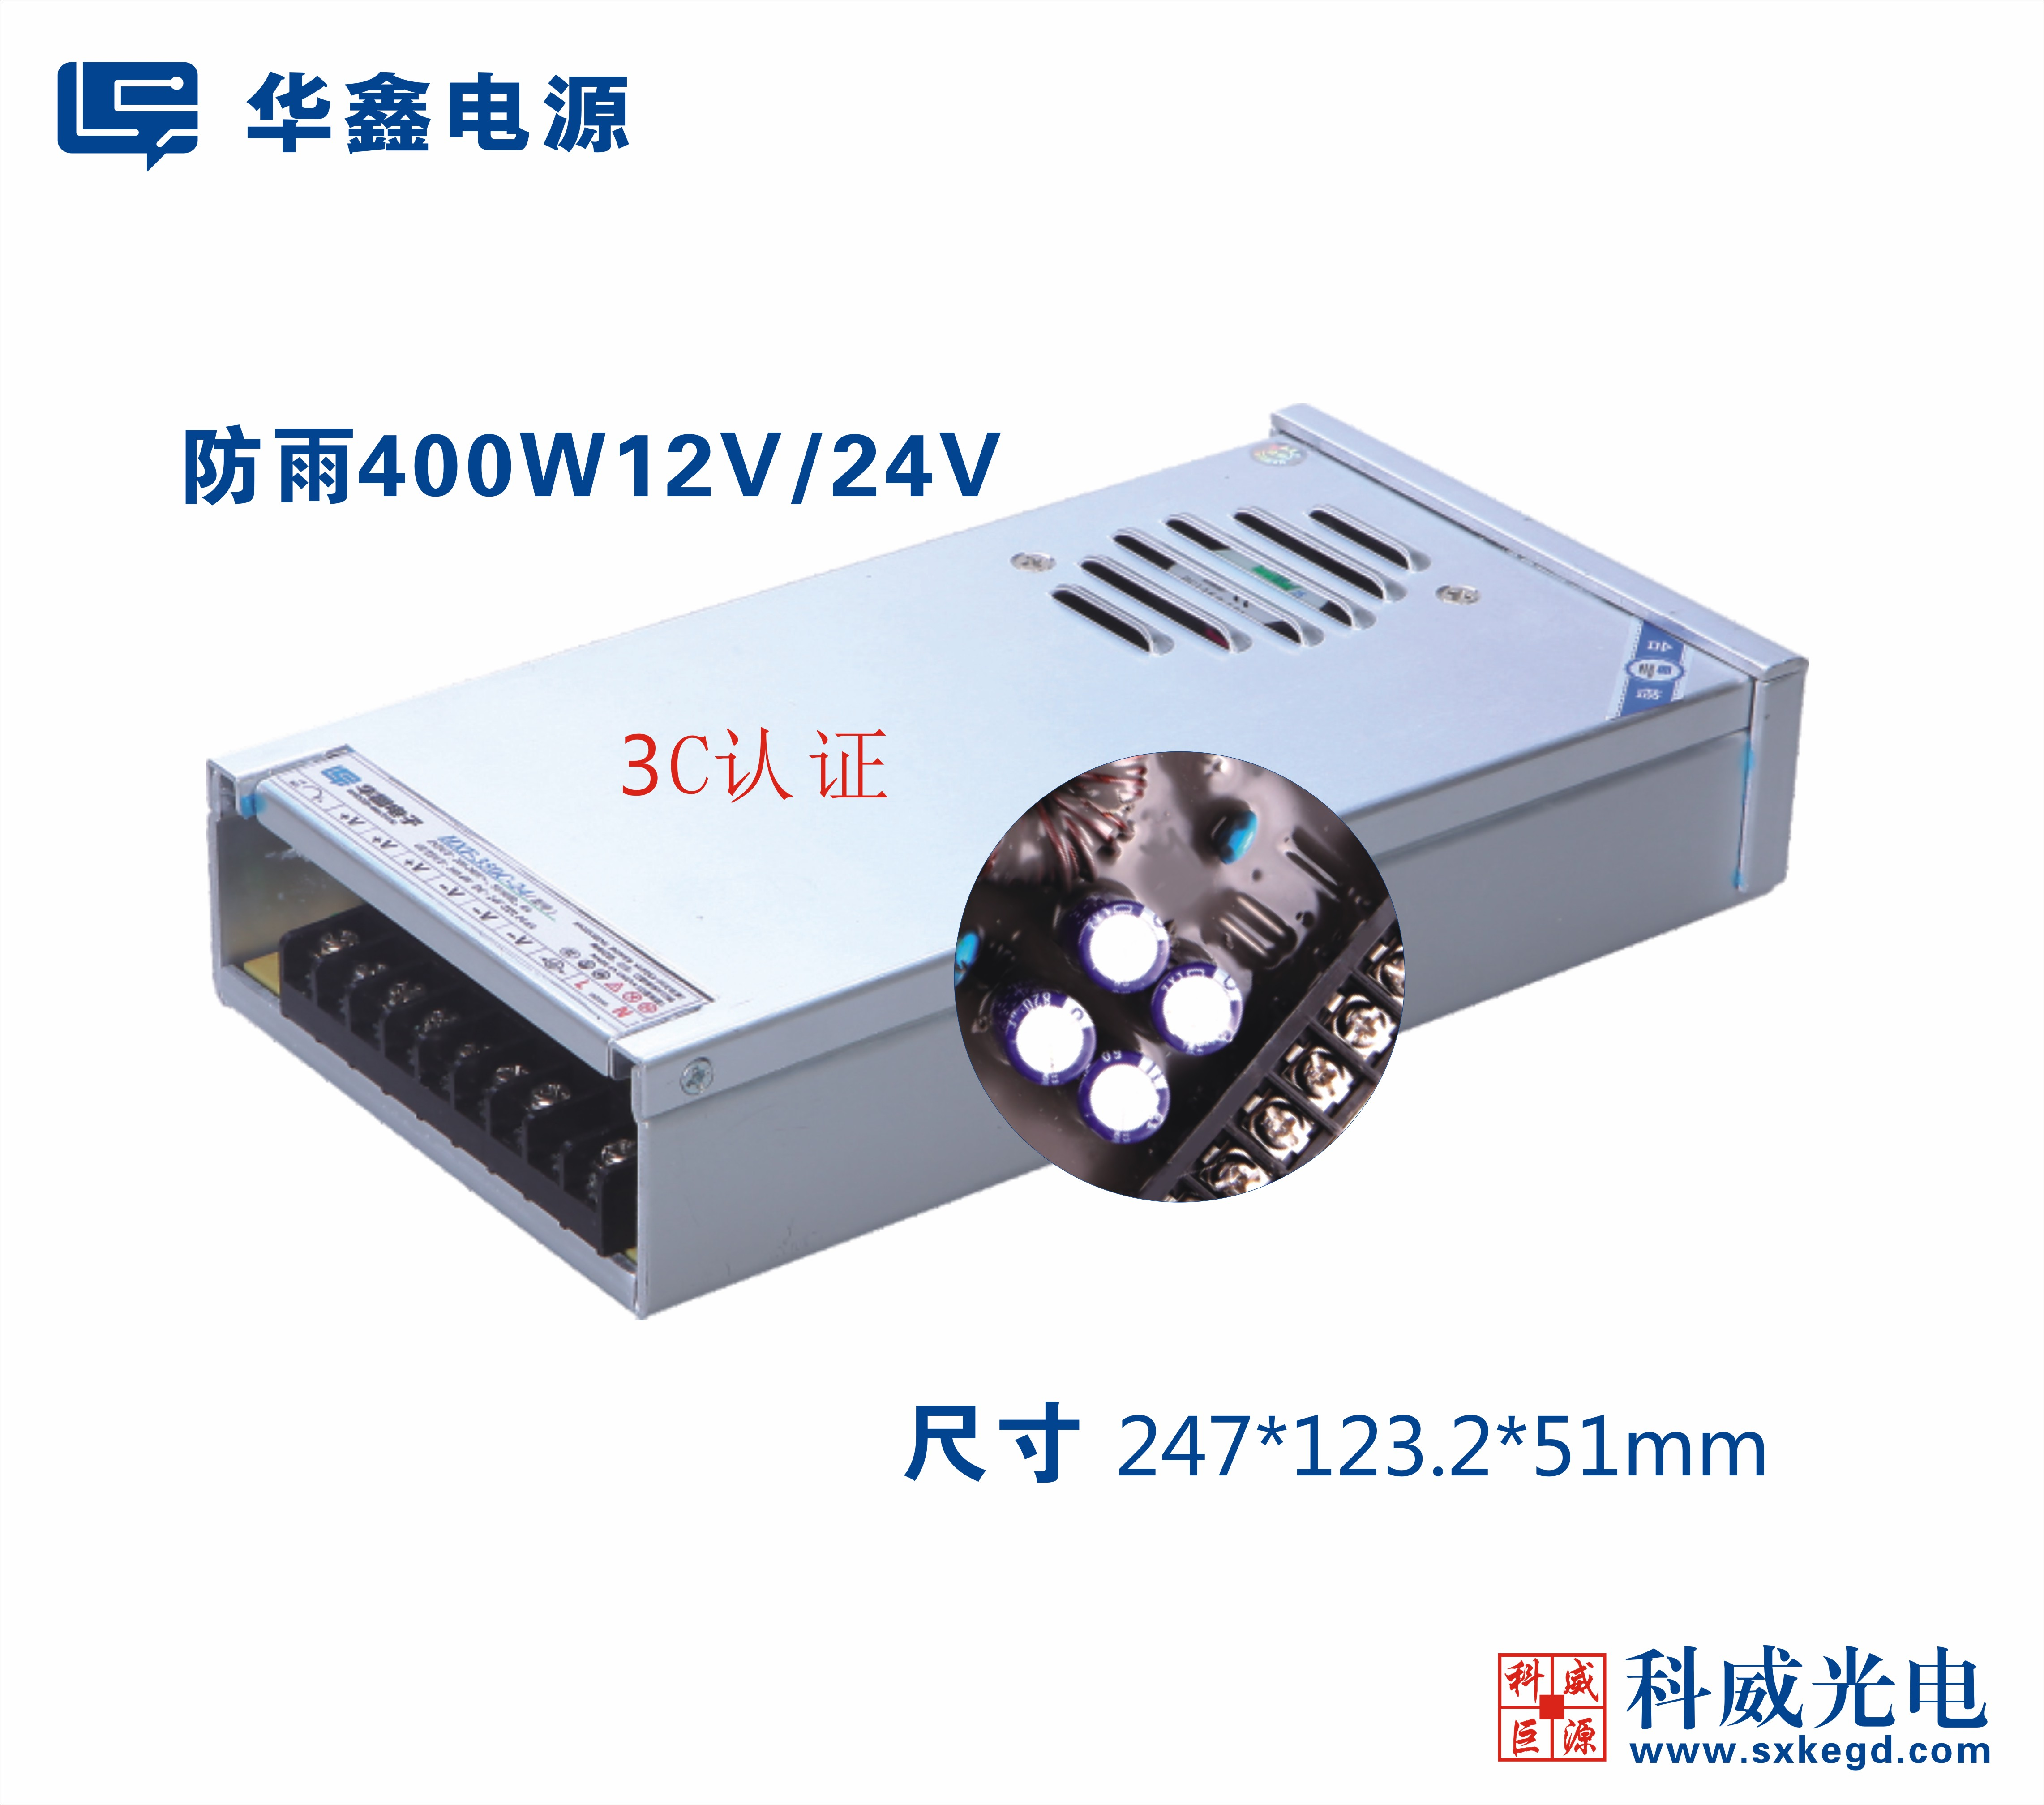 防雨工程电源400W12V/24V